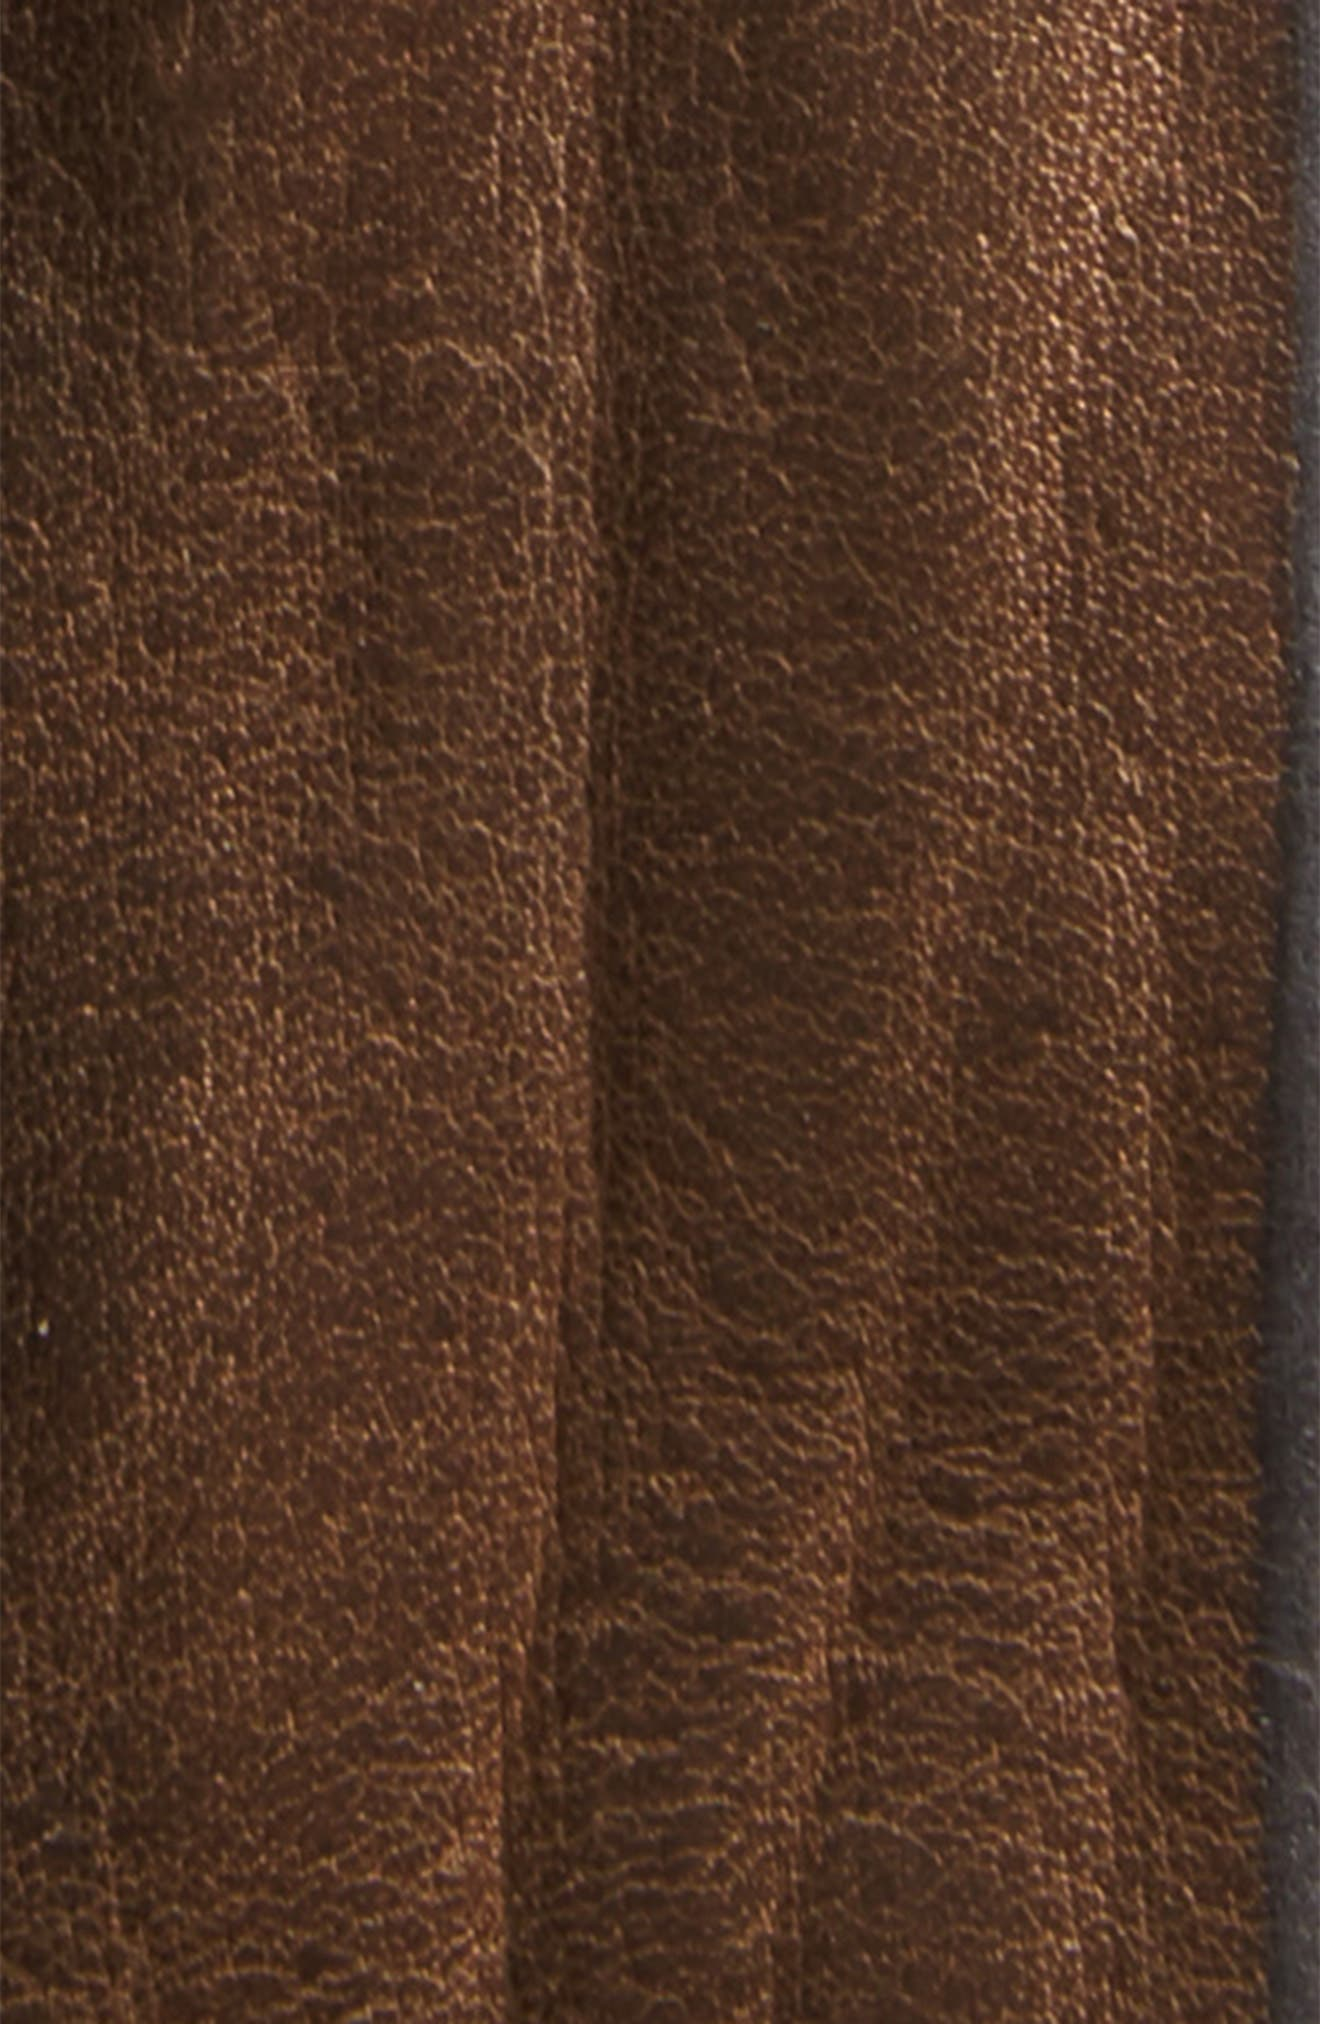 Wax Leather Belt,                             Alternate thumbnail 2, color,                             200